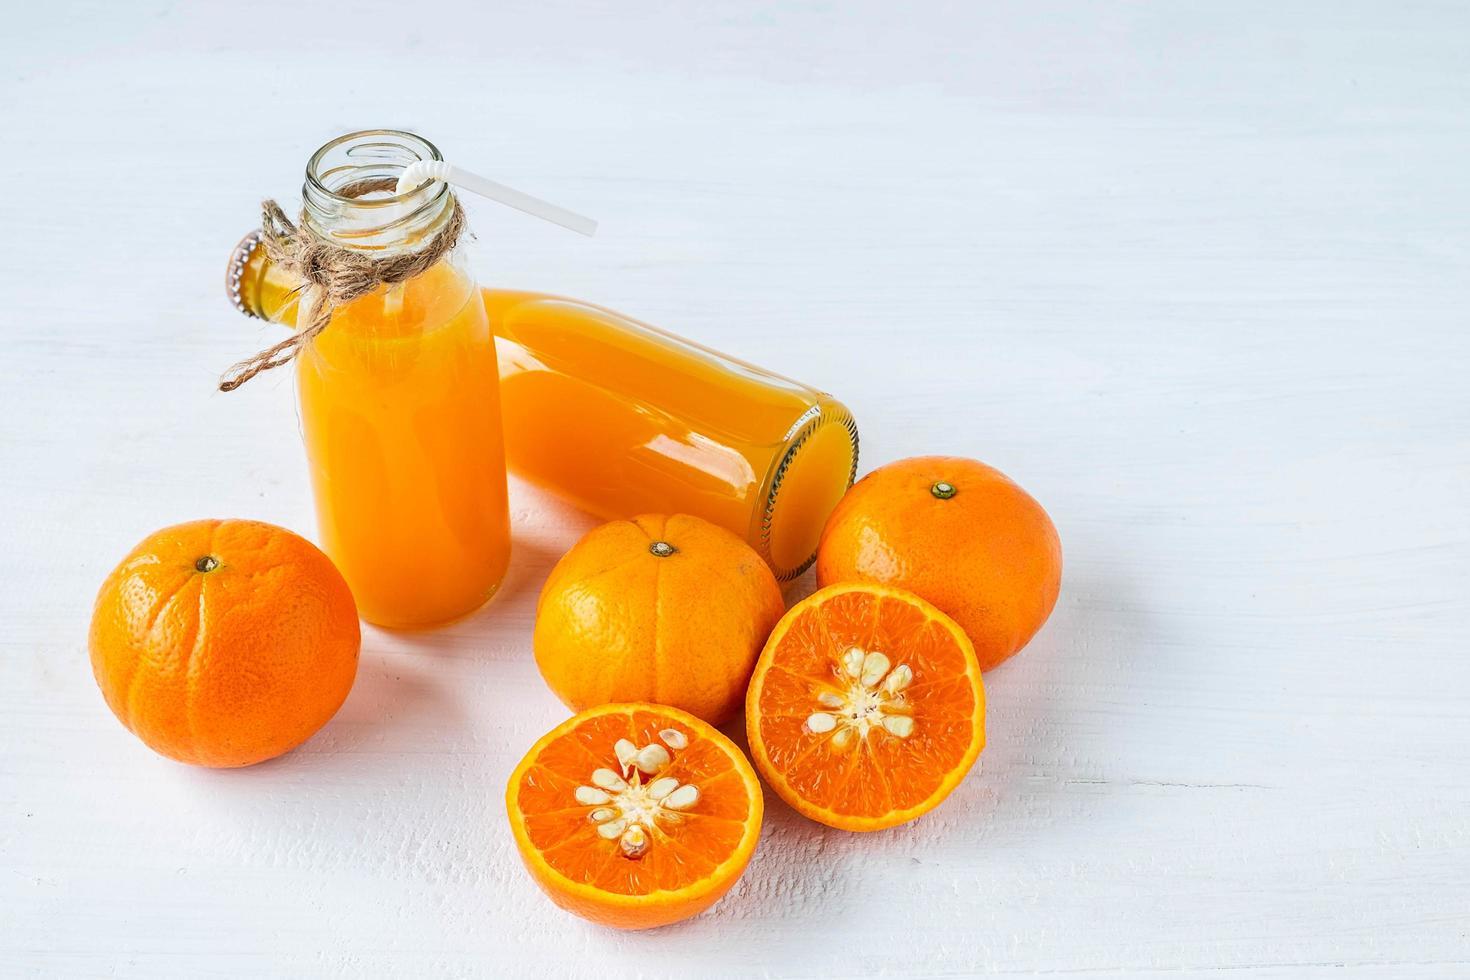 färska flaskor citrusjuice foto